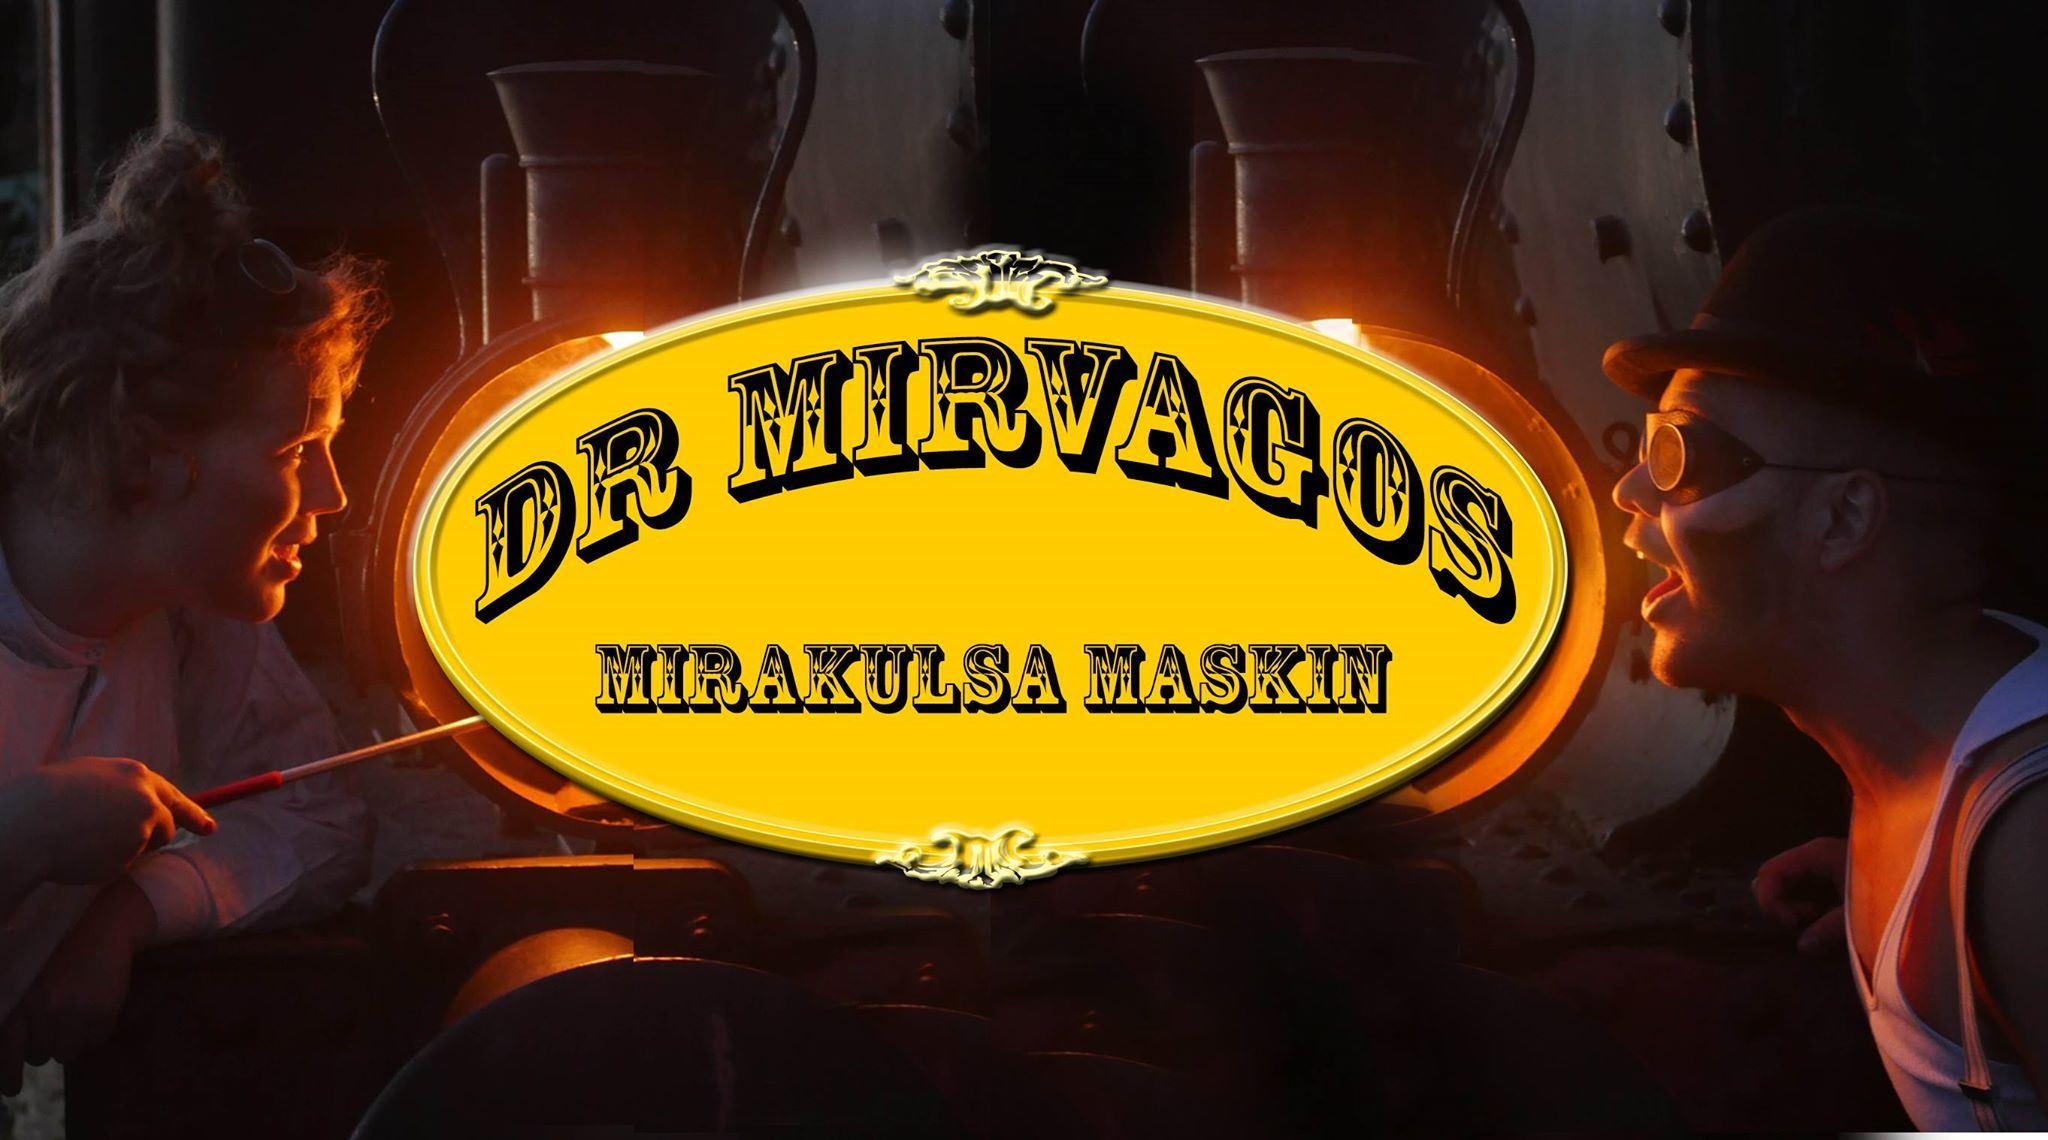 Dr. Mirvagos Mirakulösa Maskin